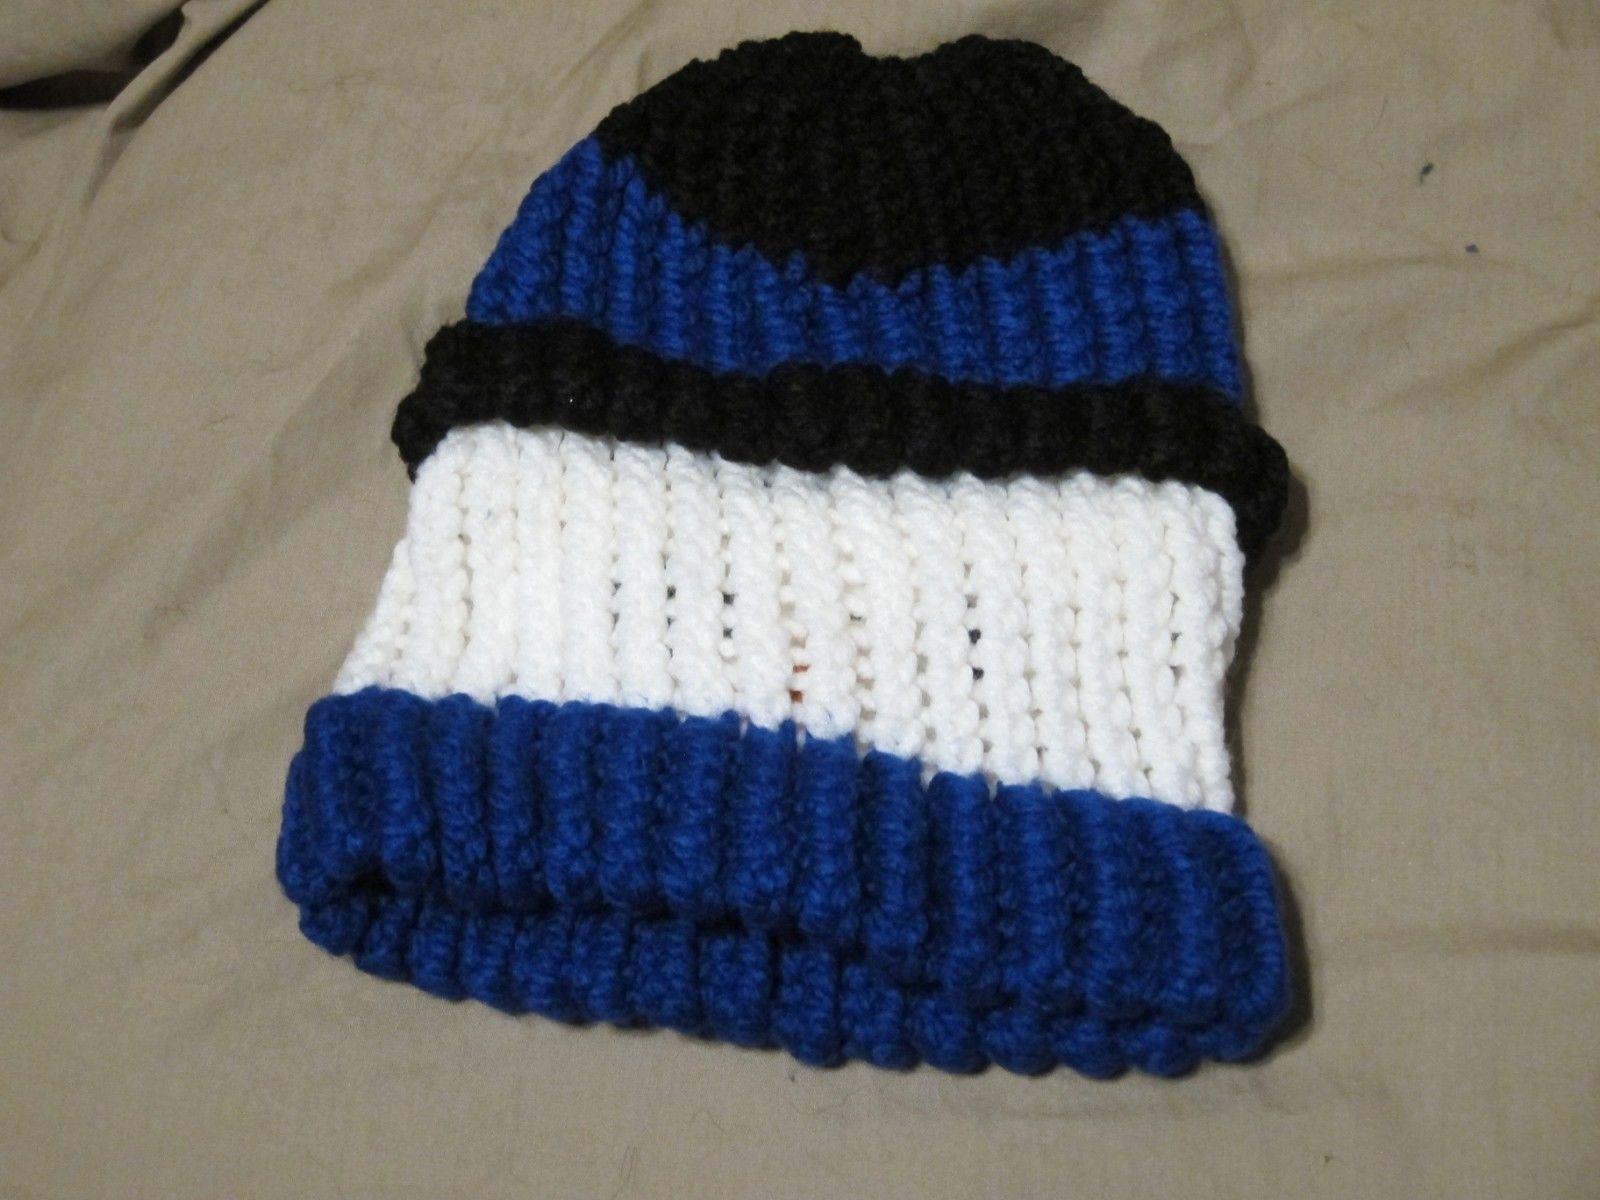 Handmade Knitted Blue Snowman Infant Winter Hat Cap CUTE